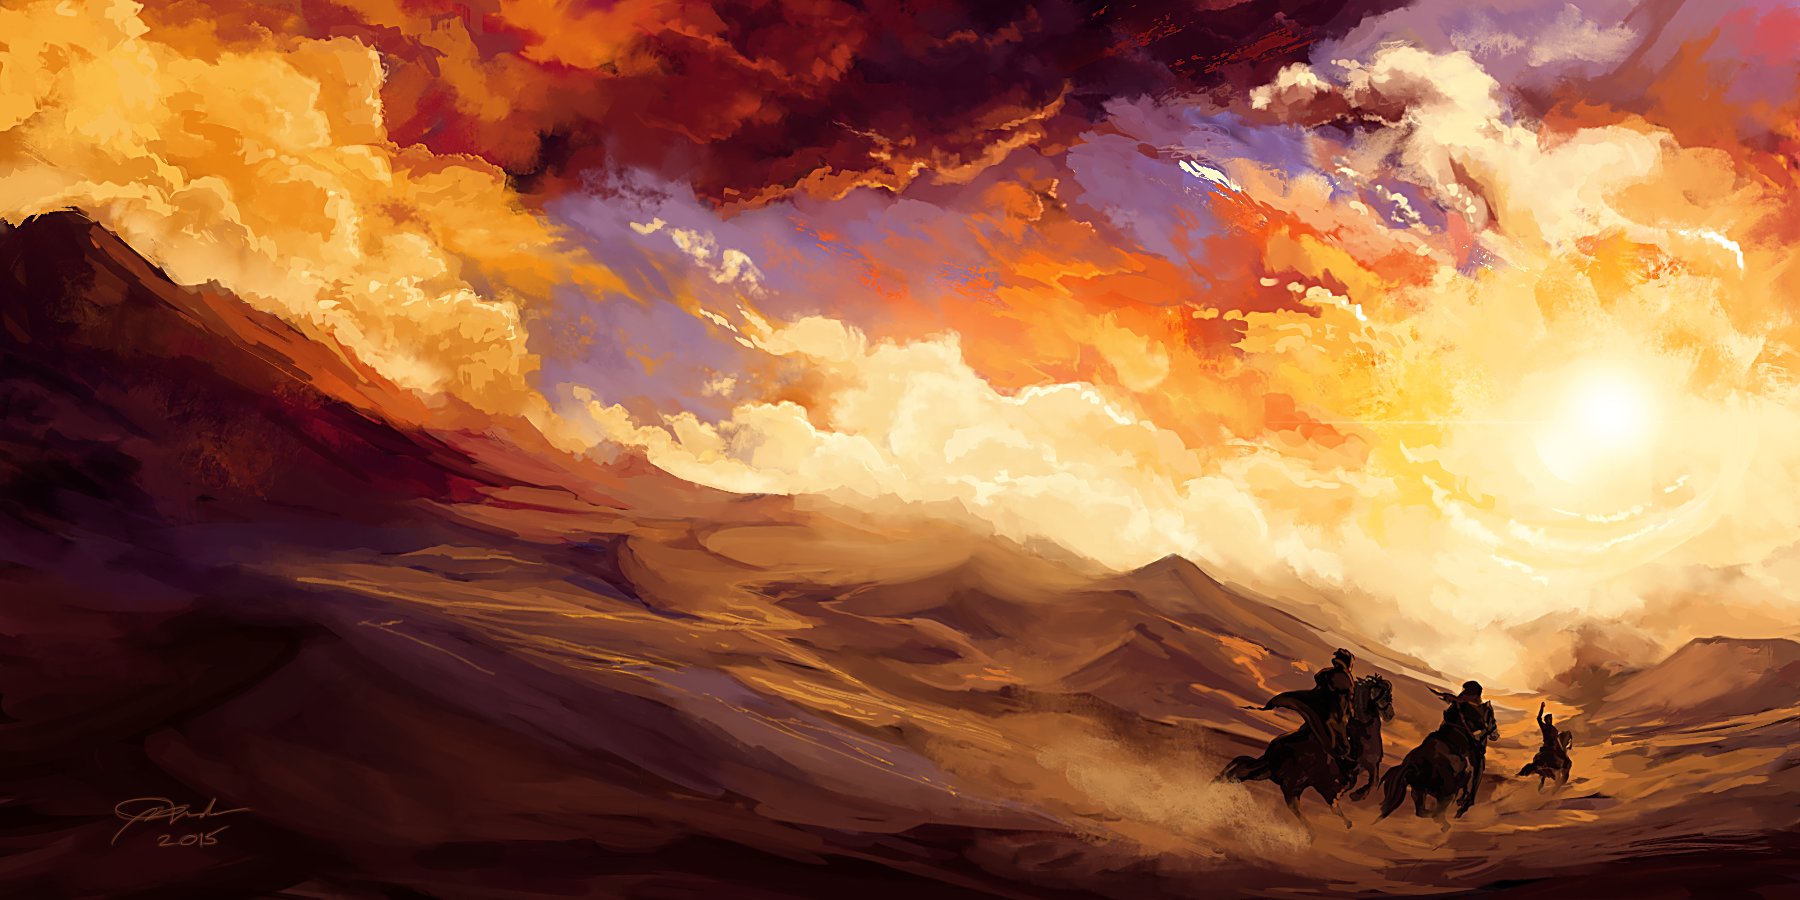 Chasing the Sun by PyriteKite